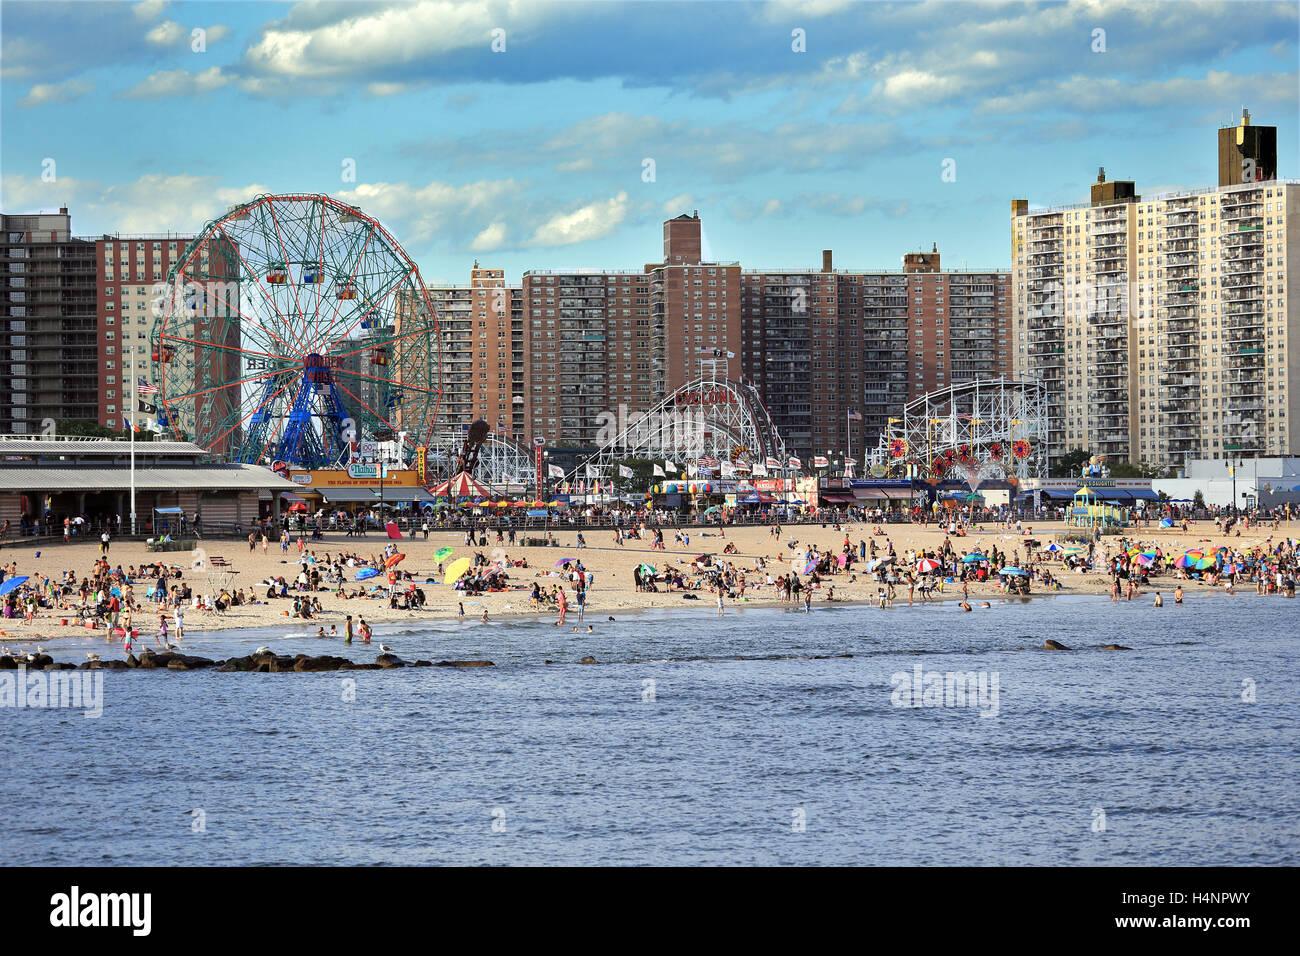 Coney Island Brooklyn New York City - Stock Image